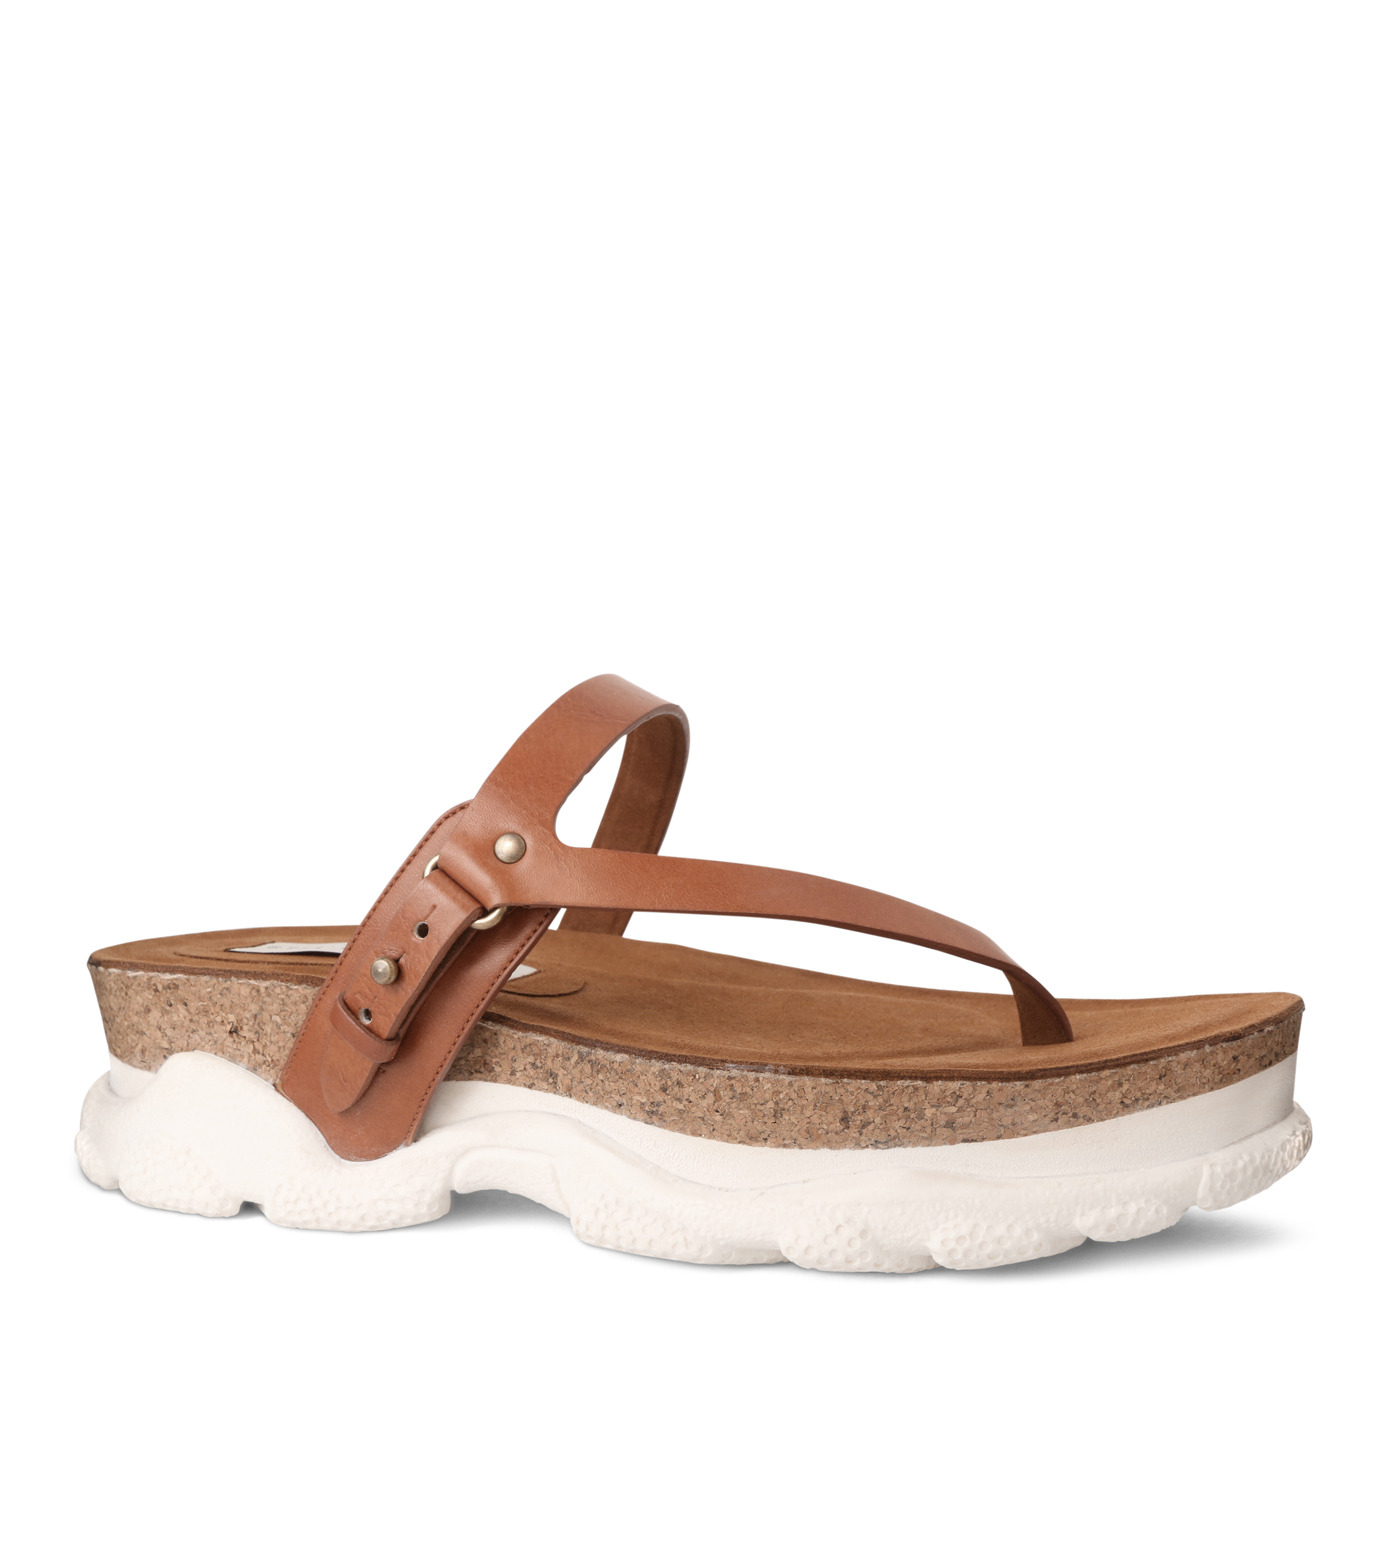 Stella McCartney(ステラマッカートニー)のSneaker Sandal-BROWN(シューズ/shoes)-423387-W0MW0-42 拡大詳細画像1